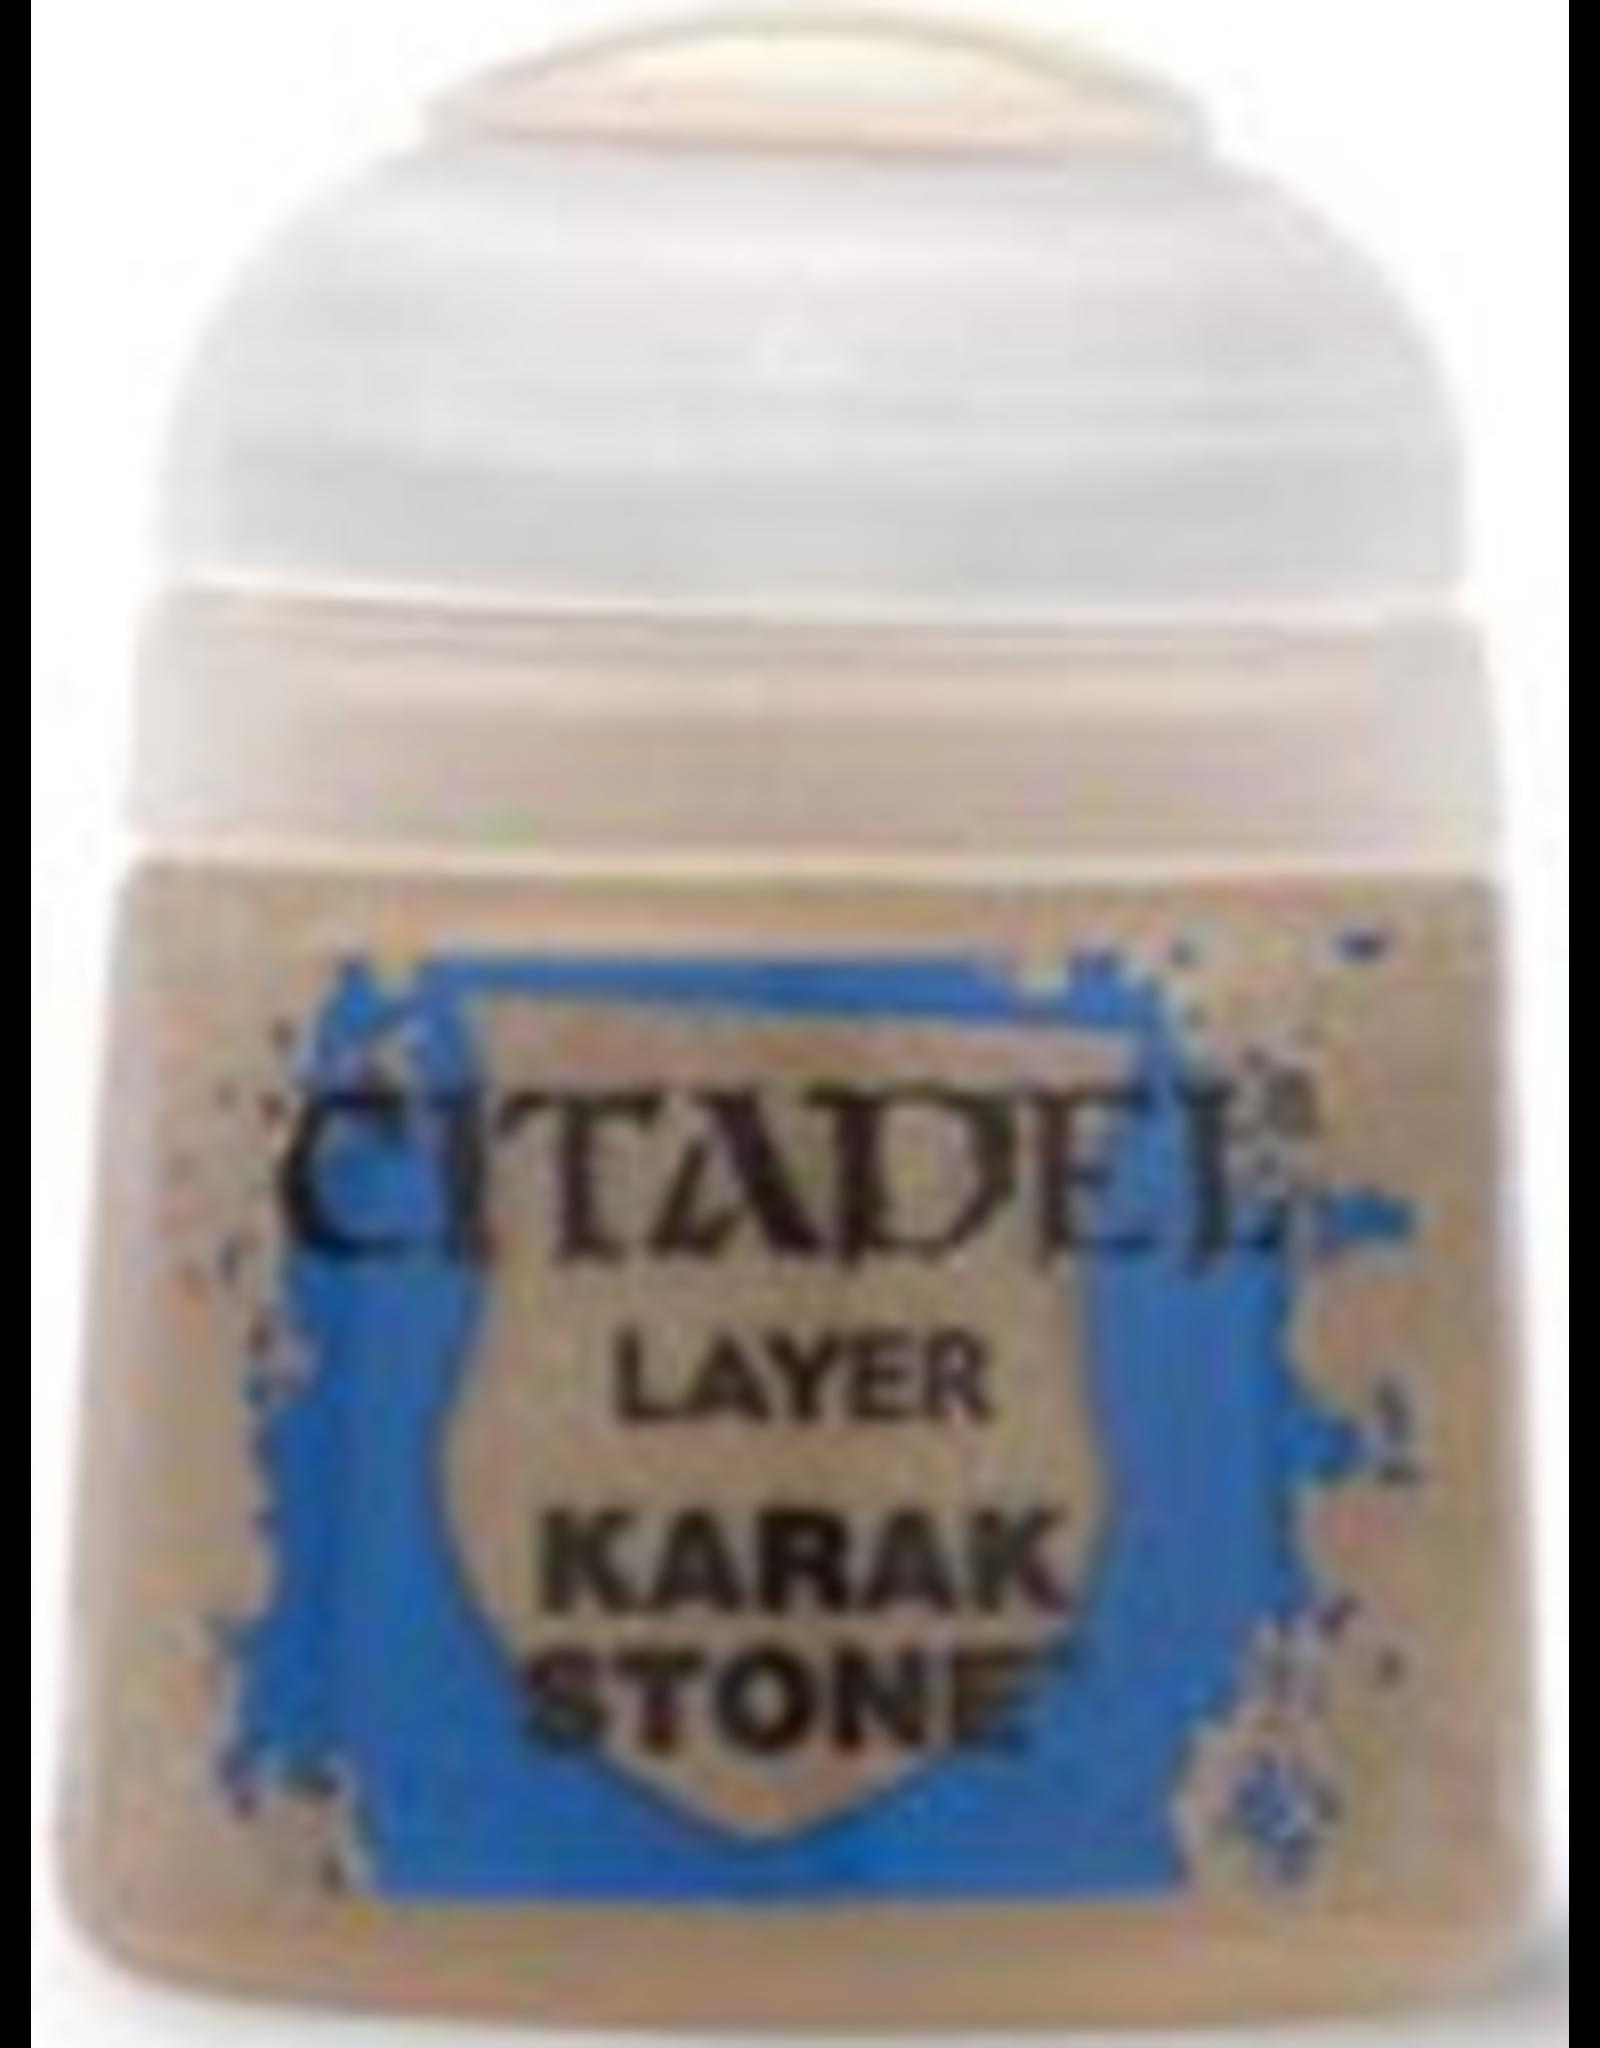 Games Workshop Citadel Layer Karak Stone